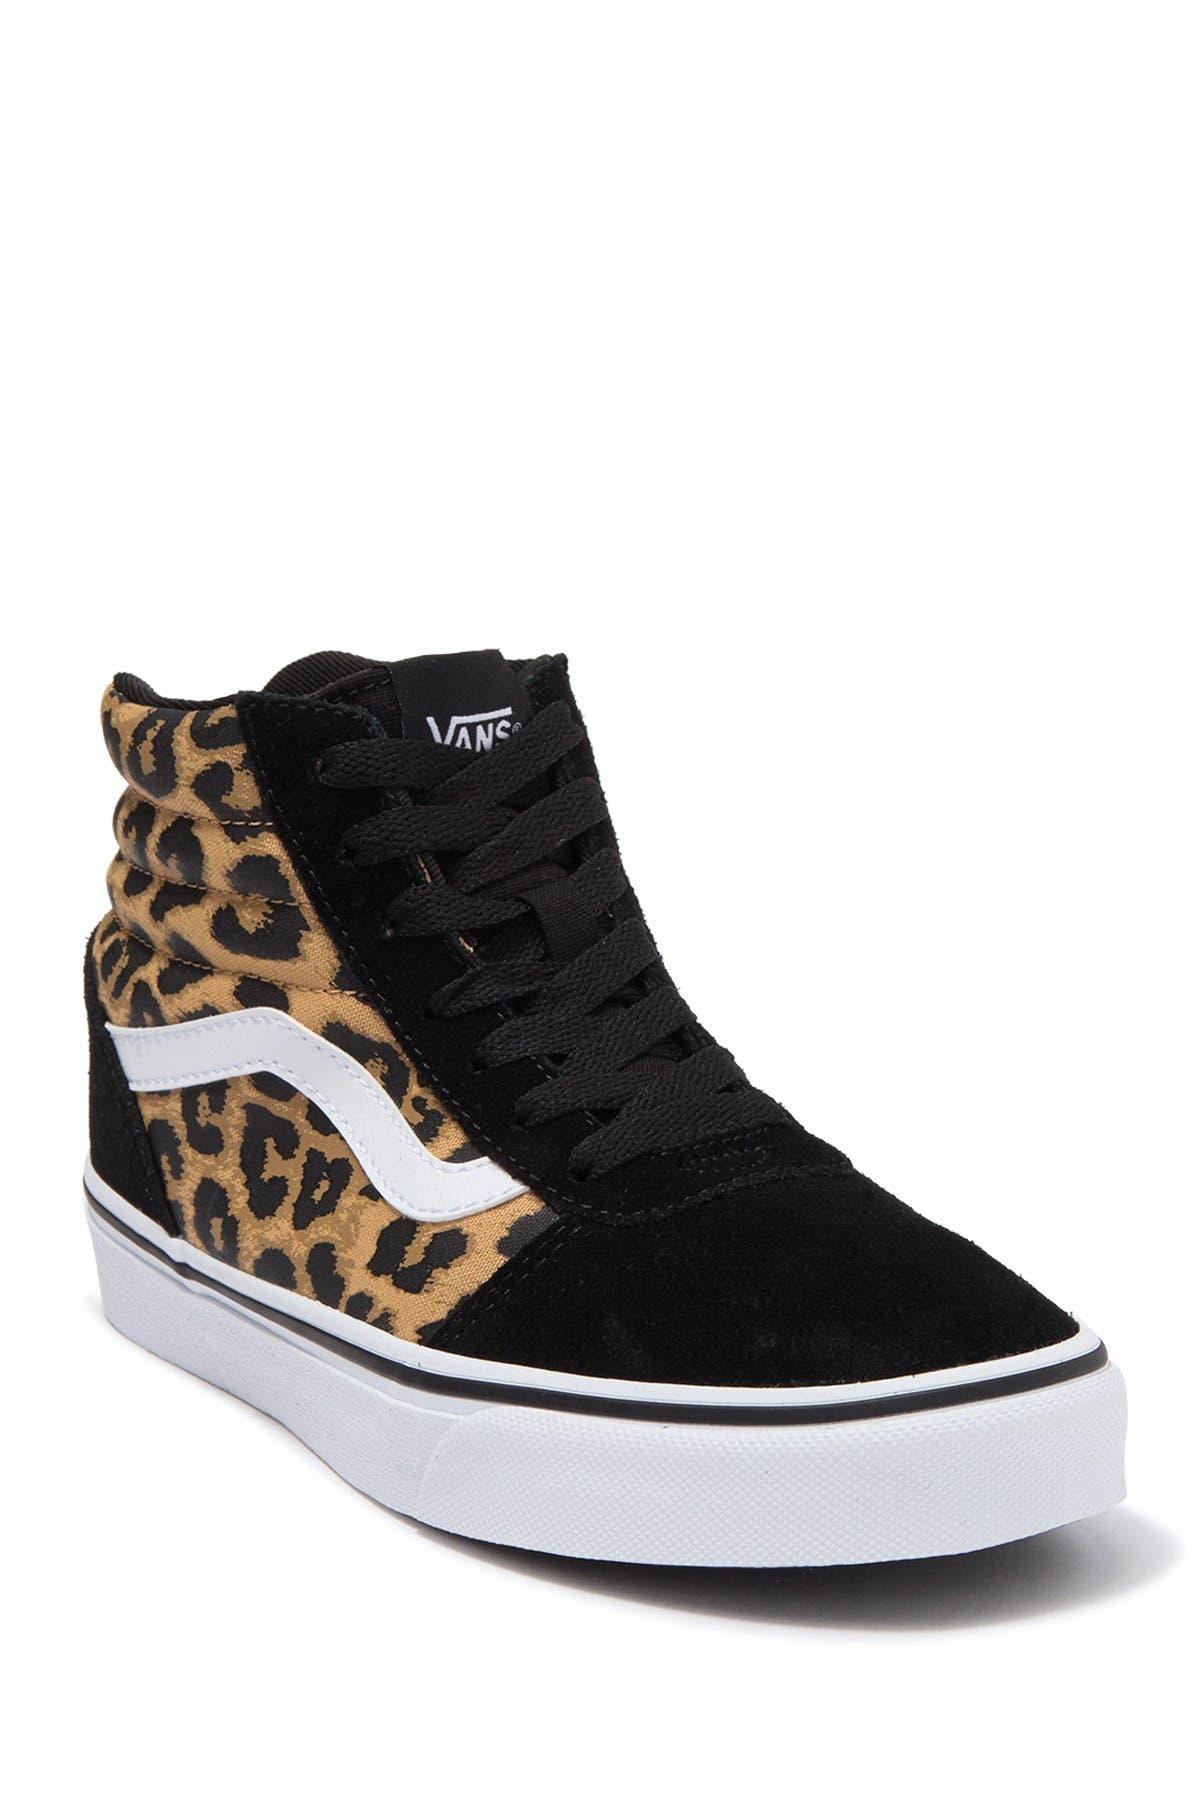 Ward Leopard Print High Top Sneaker